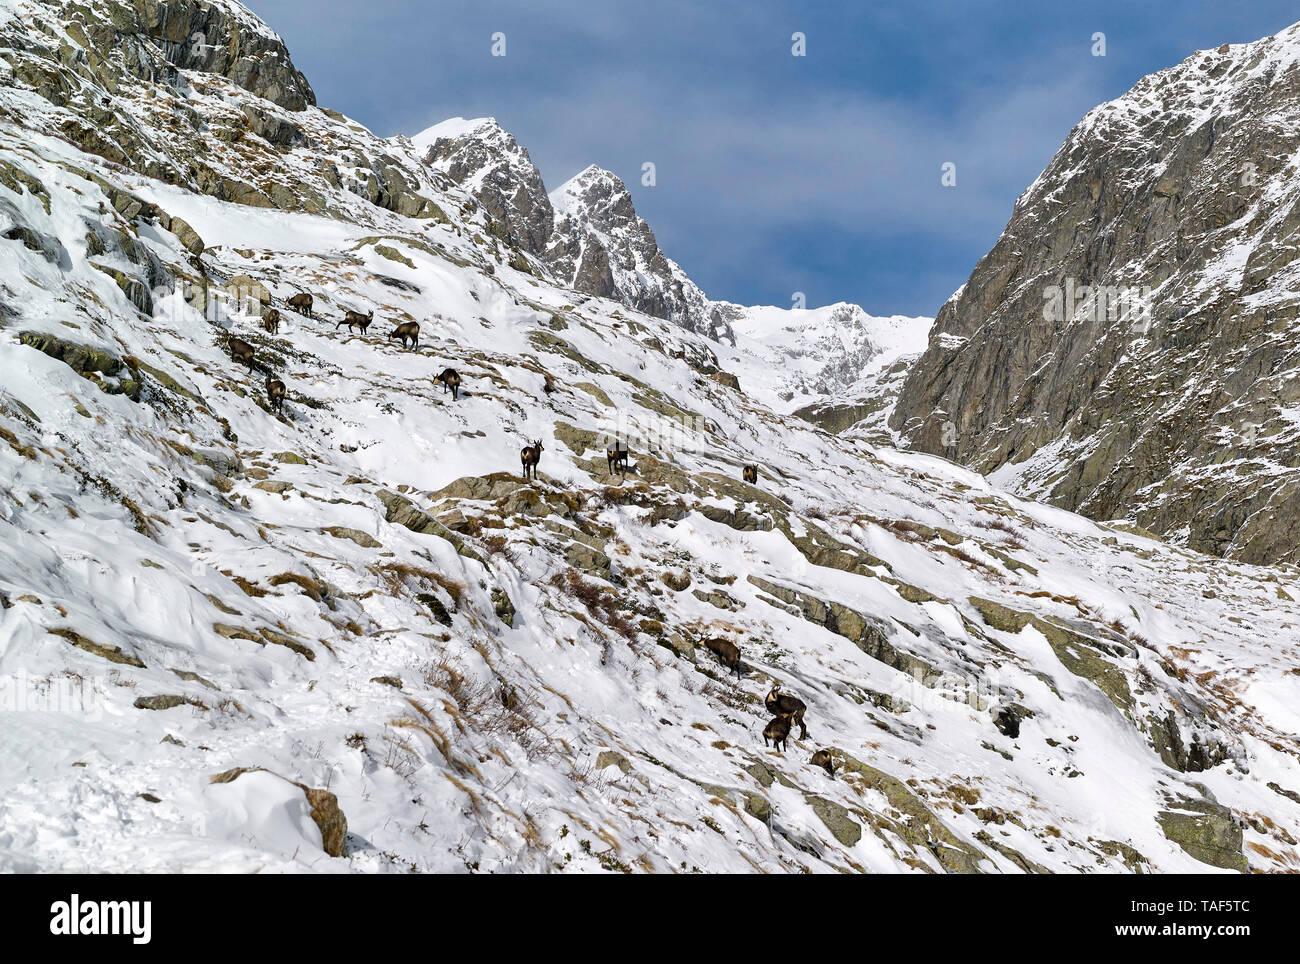 Alpine Chamois Flock (Rupicapra rupicapra) grazing in the Gordolasque Valley in autumn, Mercantour National Park, Alps, France Stock Photo